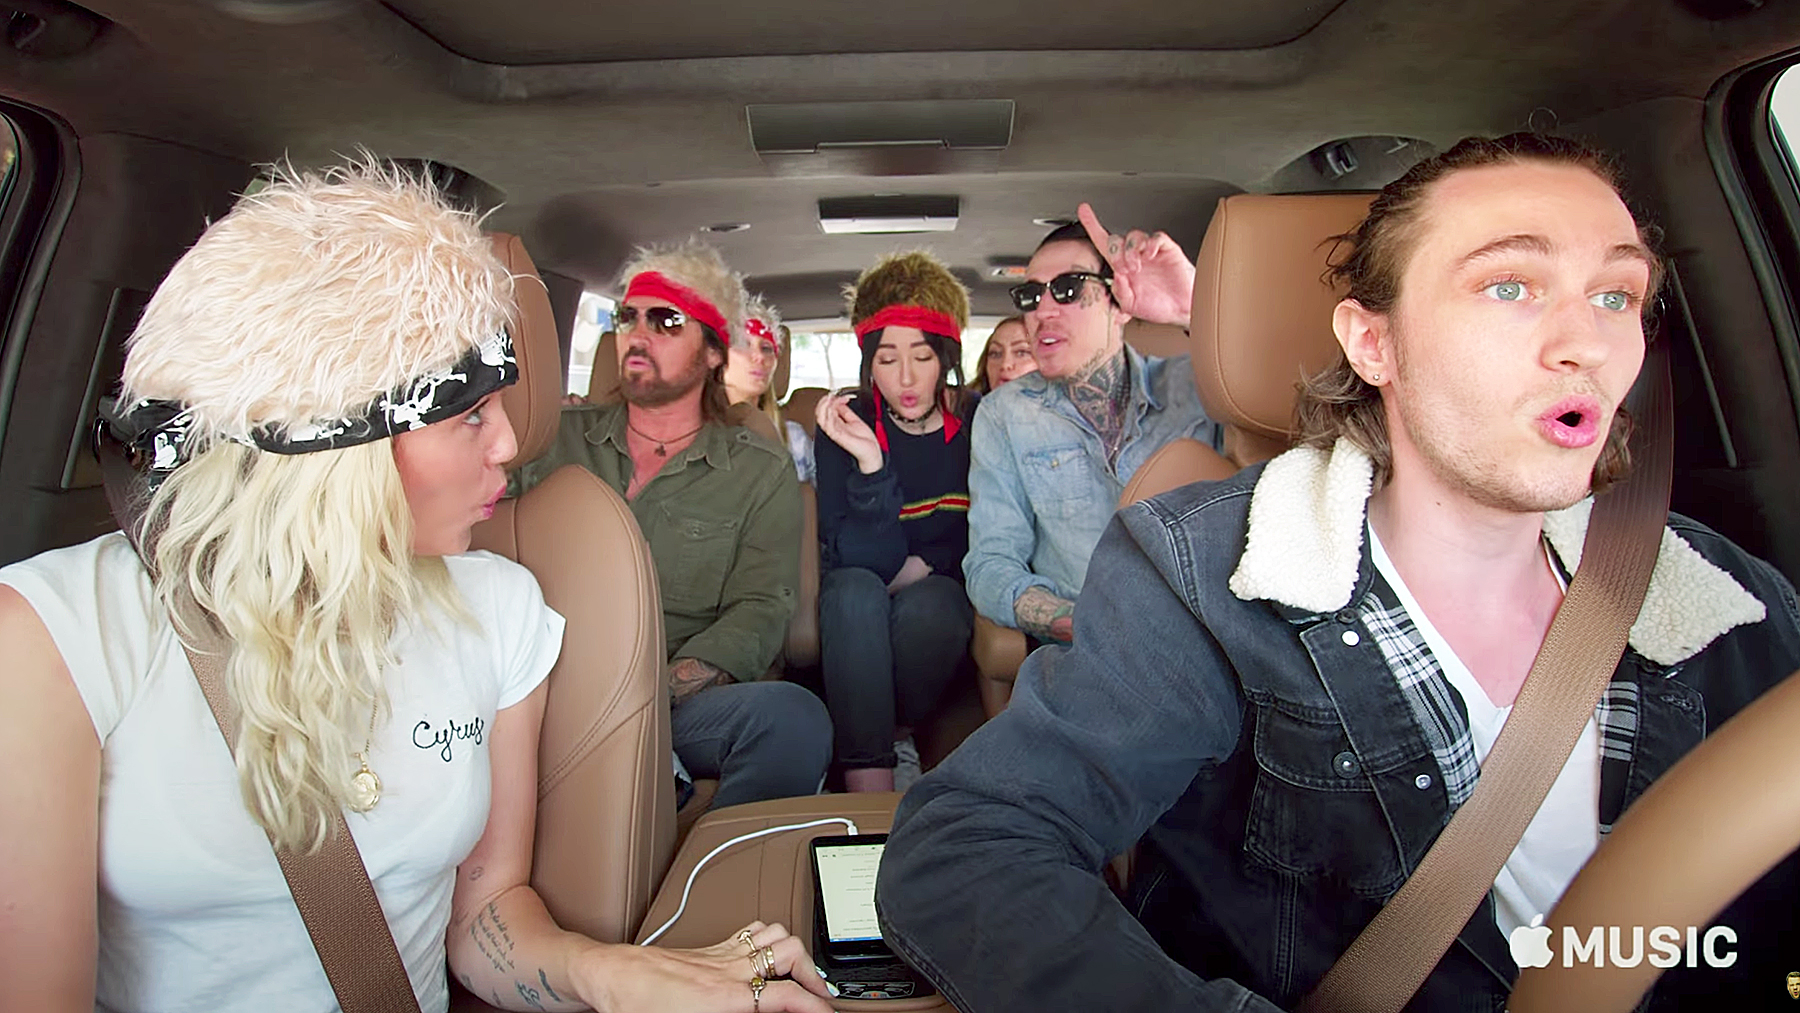 Cyrus Family carpool karaoke Achy Breaky Heart Miley Cyrus Billy ray Cyrus Noah Cyrus